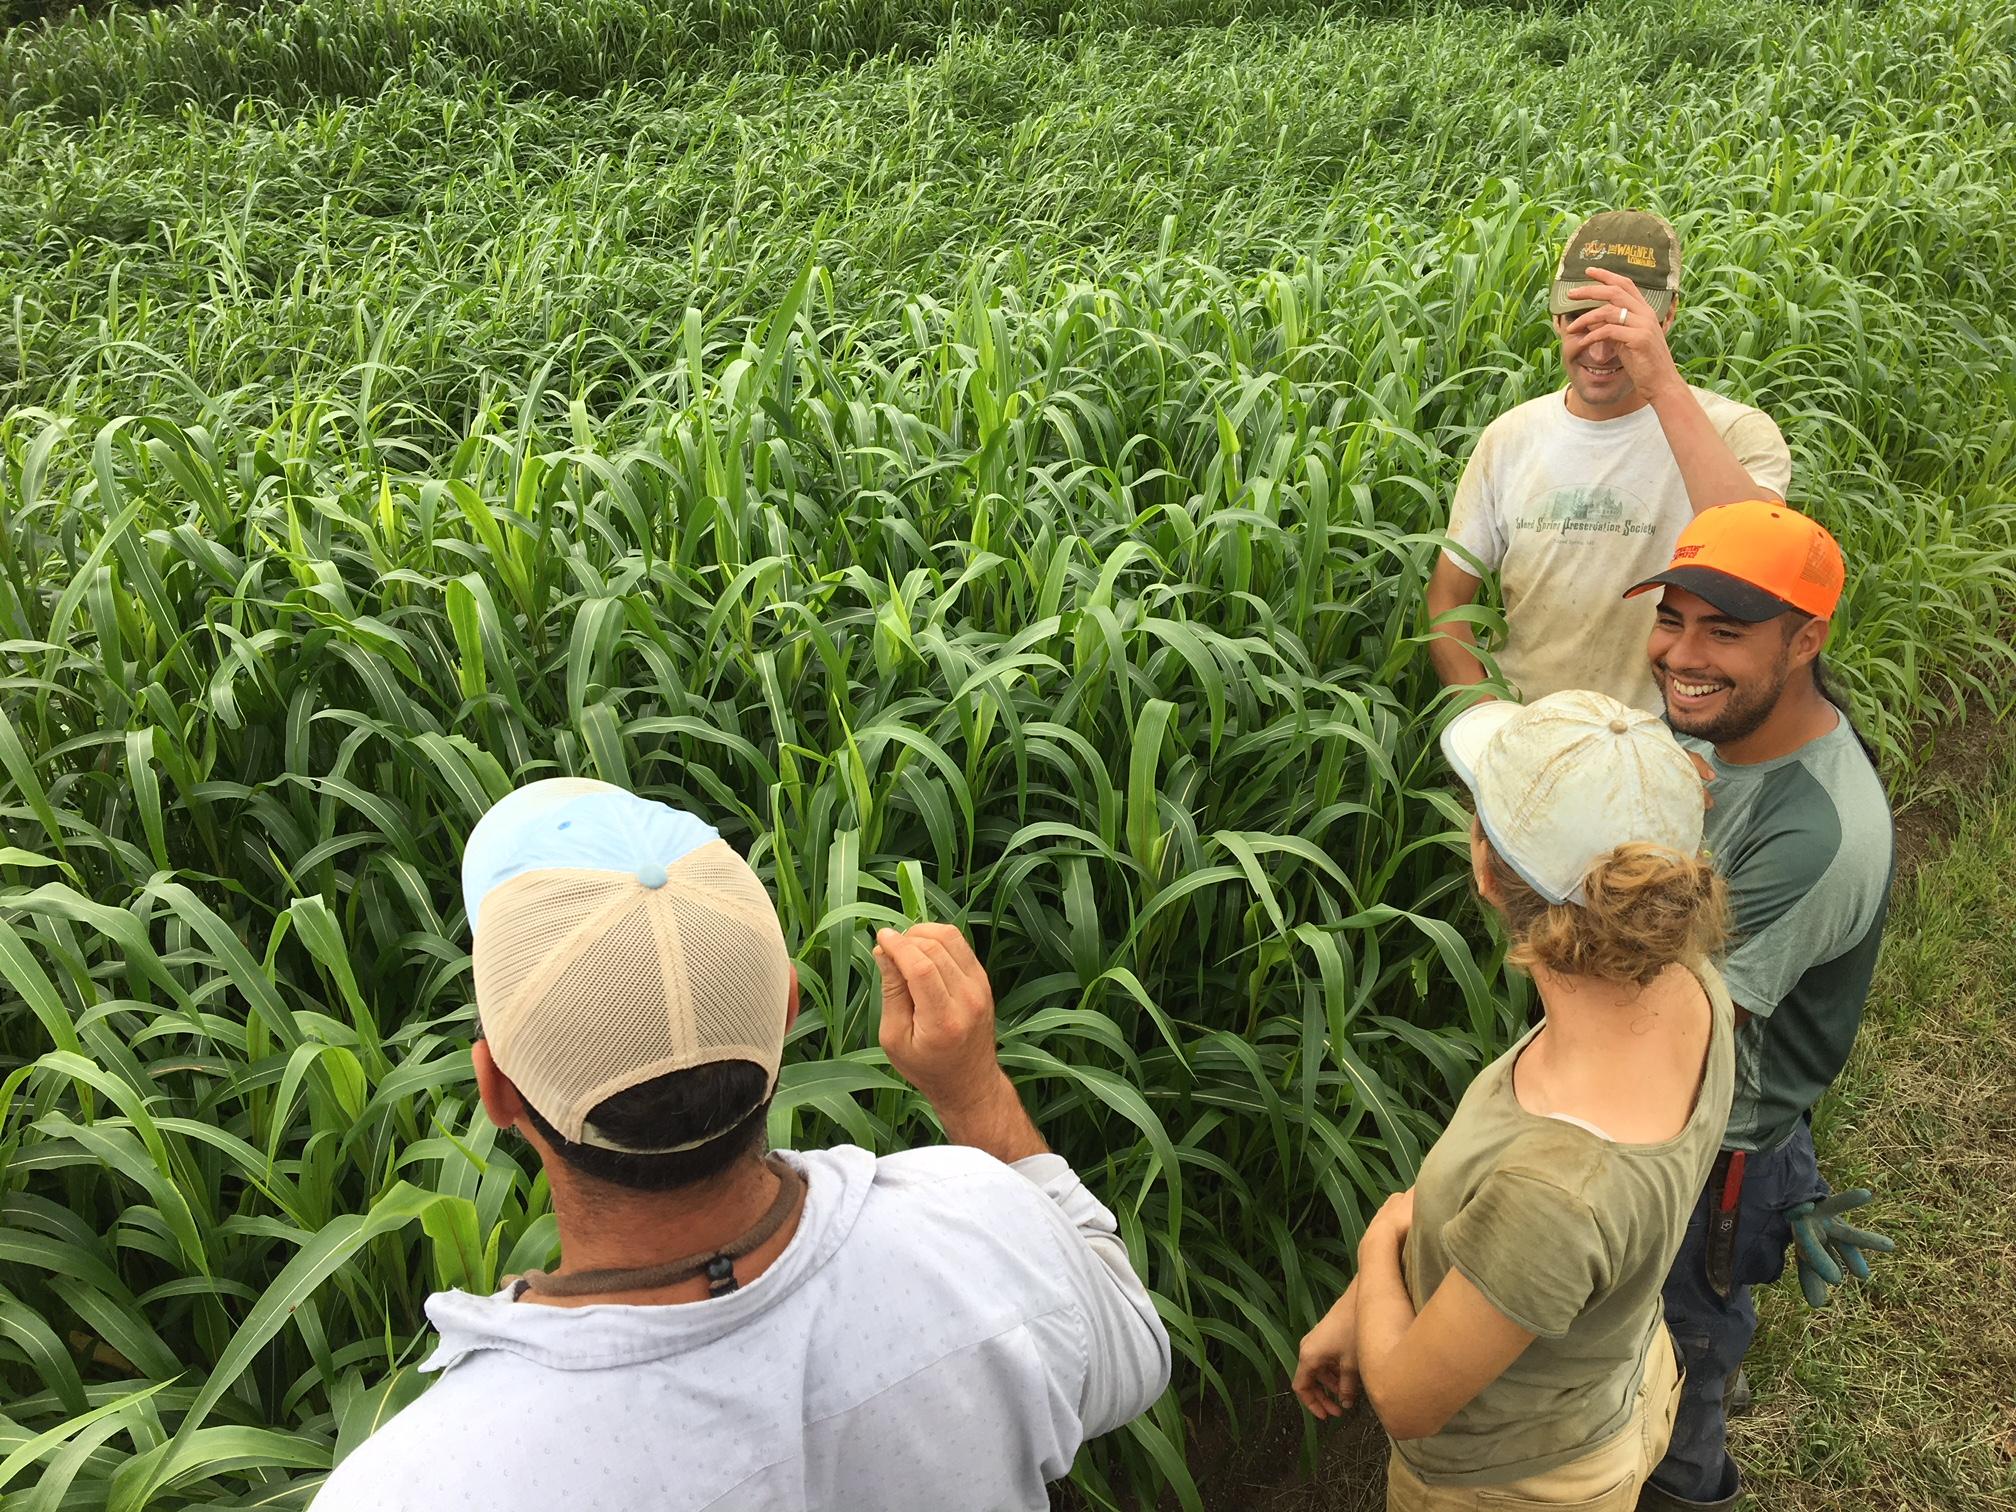 The farm team surveying the sudan grass